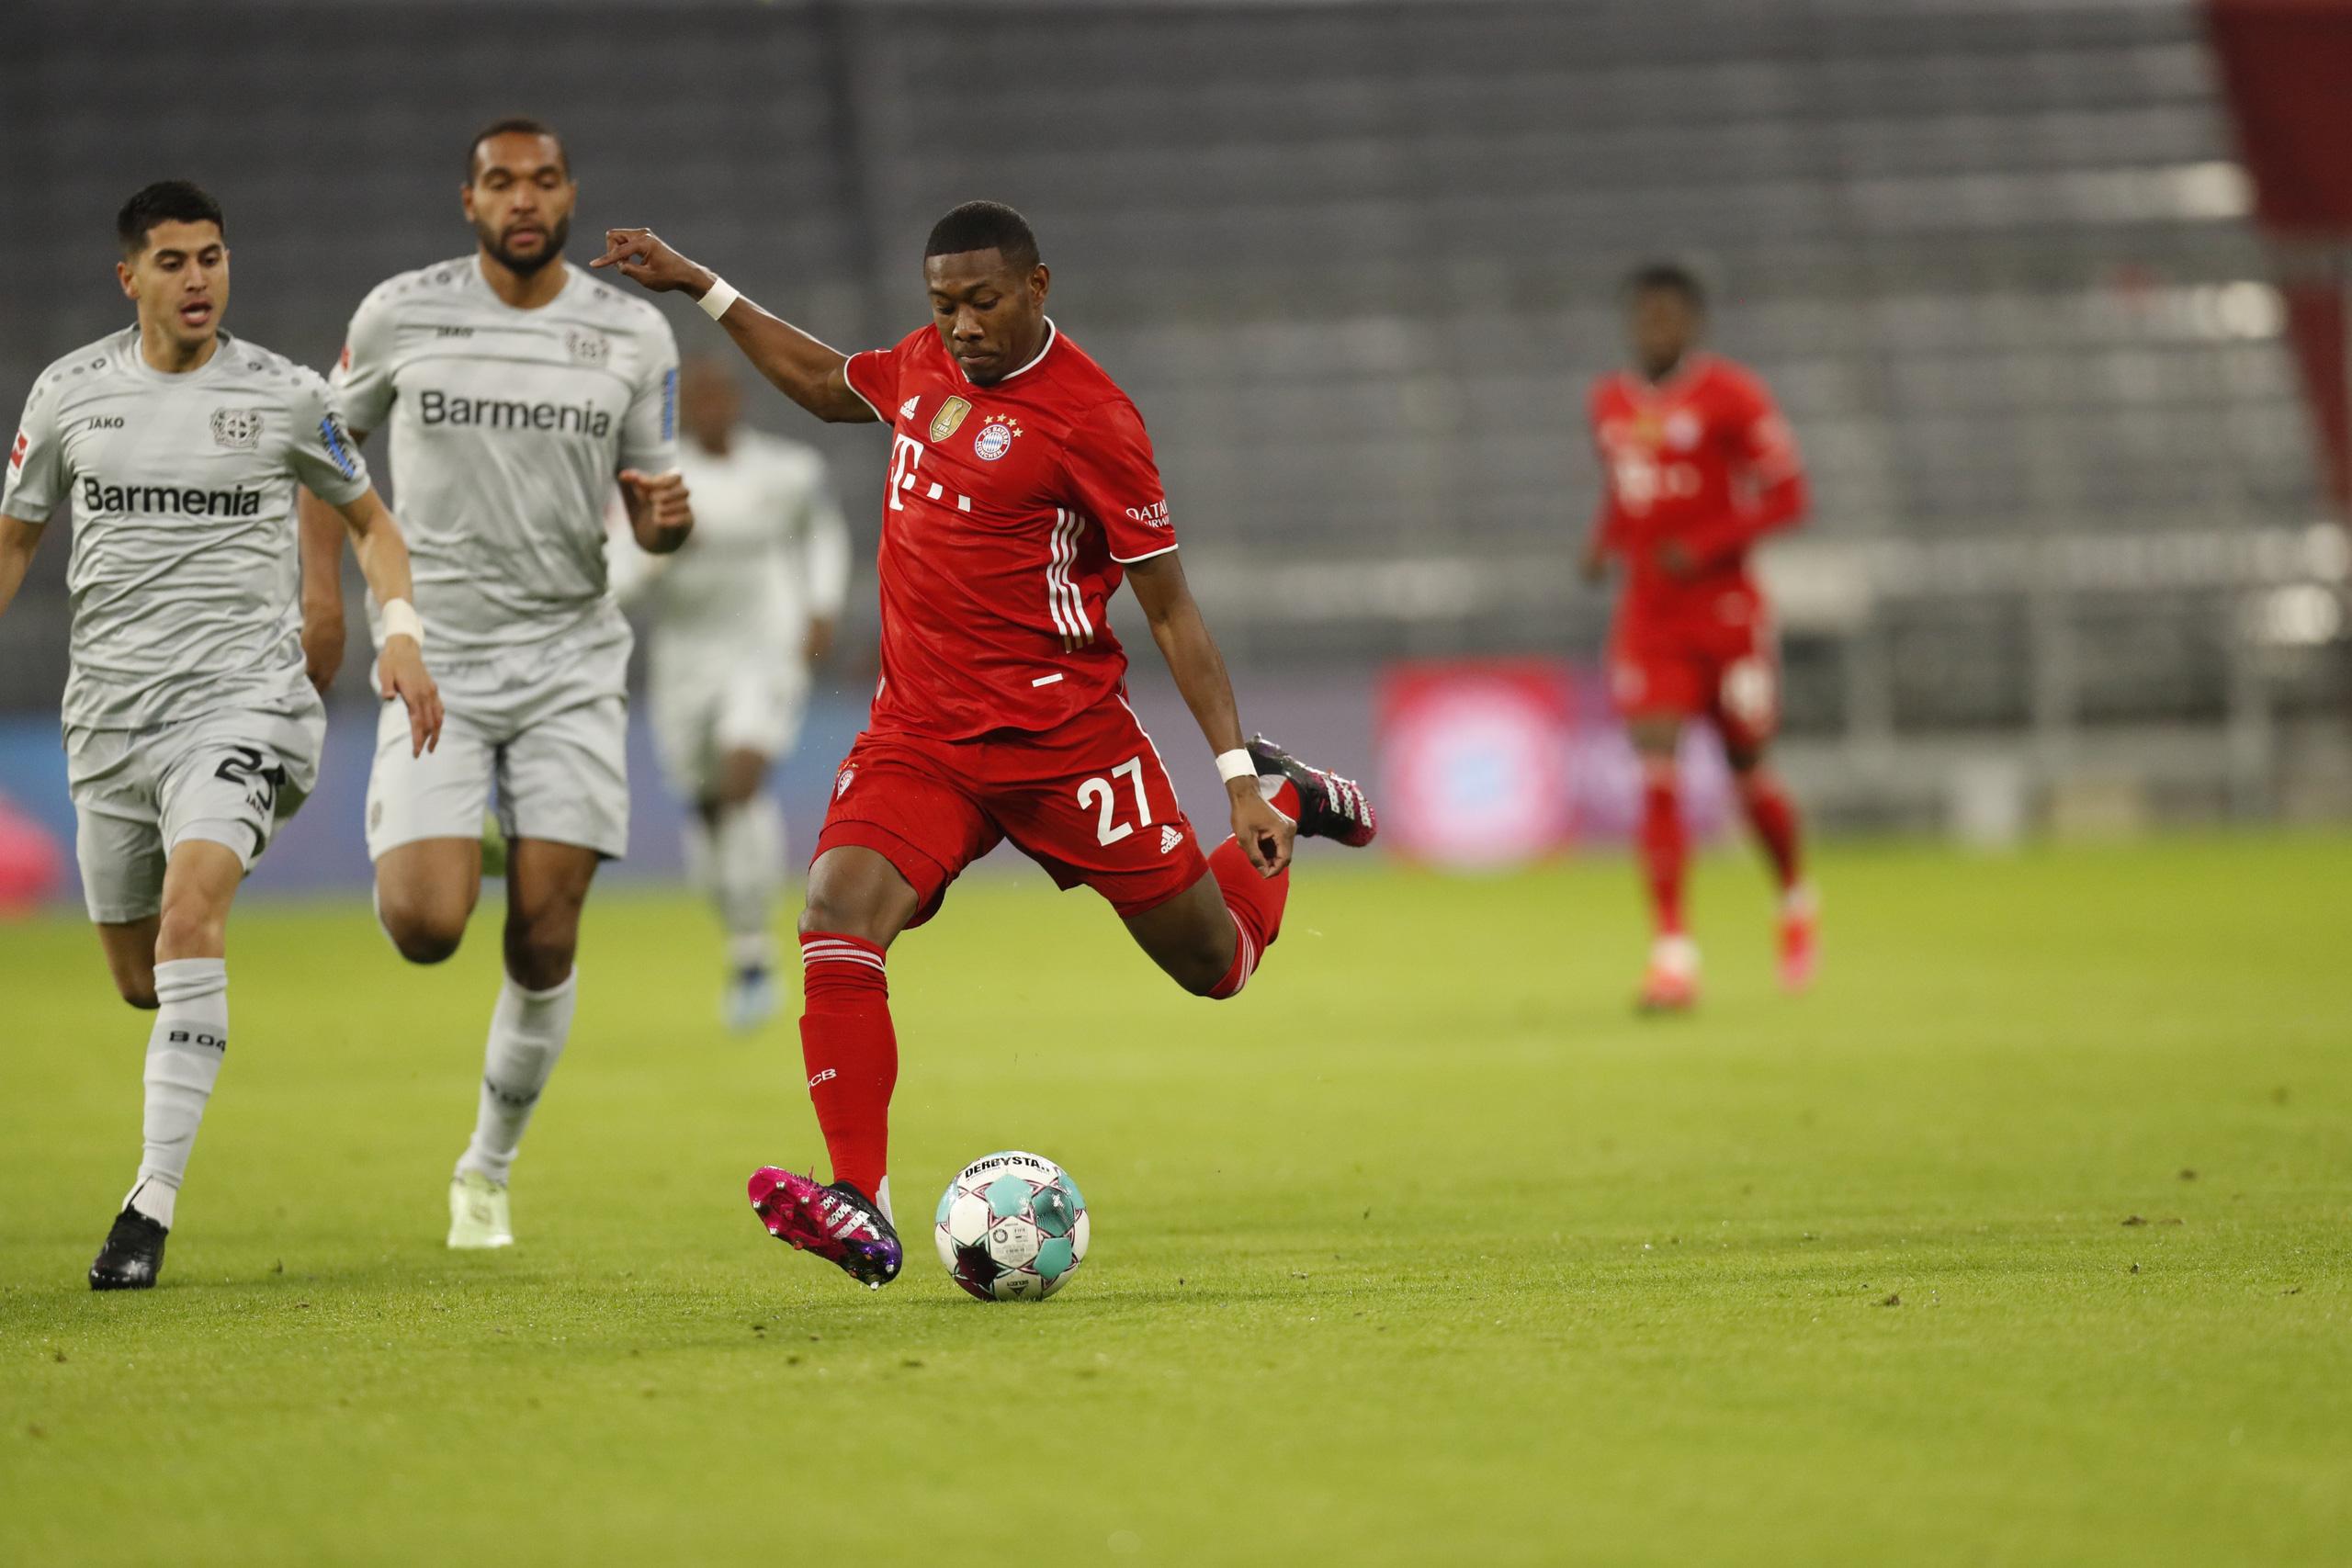 Bayern Munich băng băng về đích ở Bundesliga - Ảnh 5.